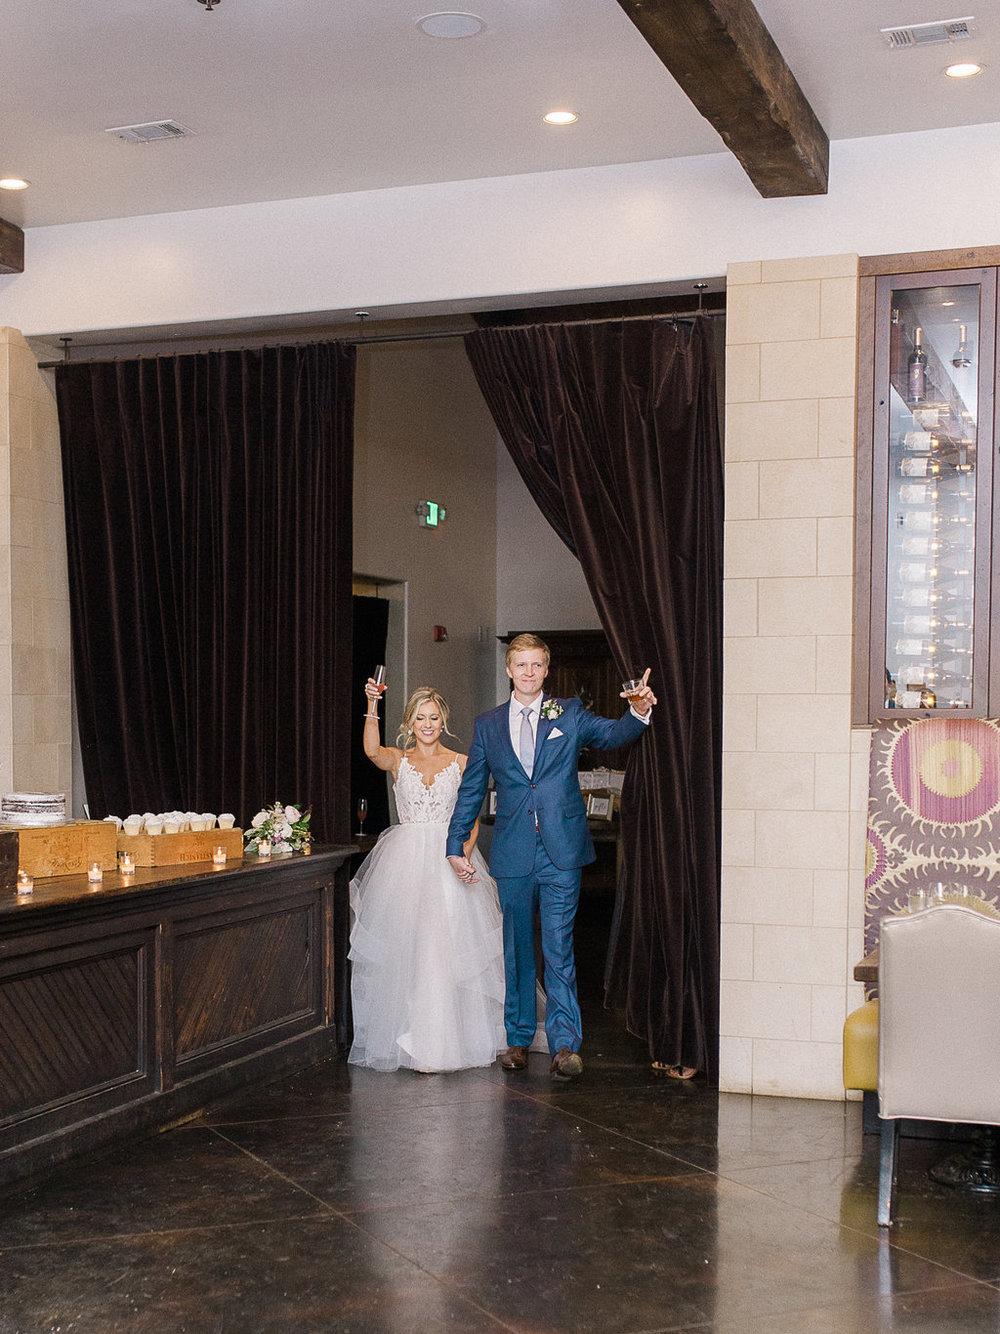 montaluce-winery-dahlonega-atlanta-wedding-photographer-fine-art-film-hannah-forsberg62.JPG